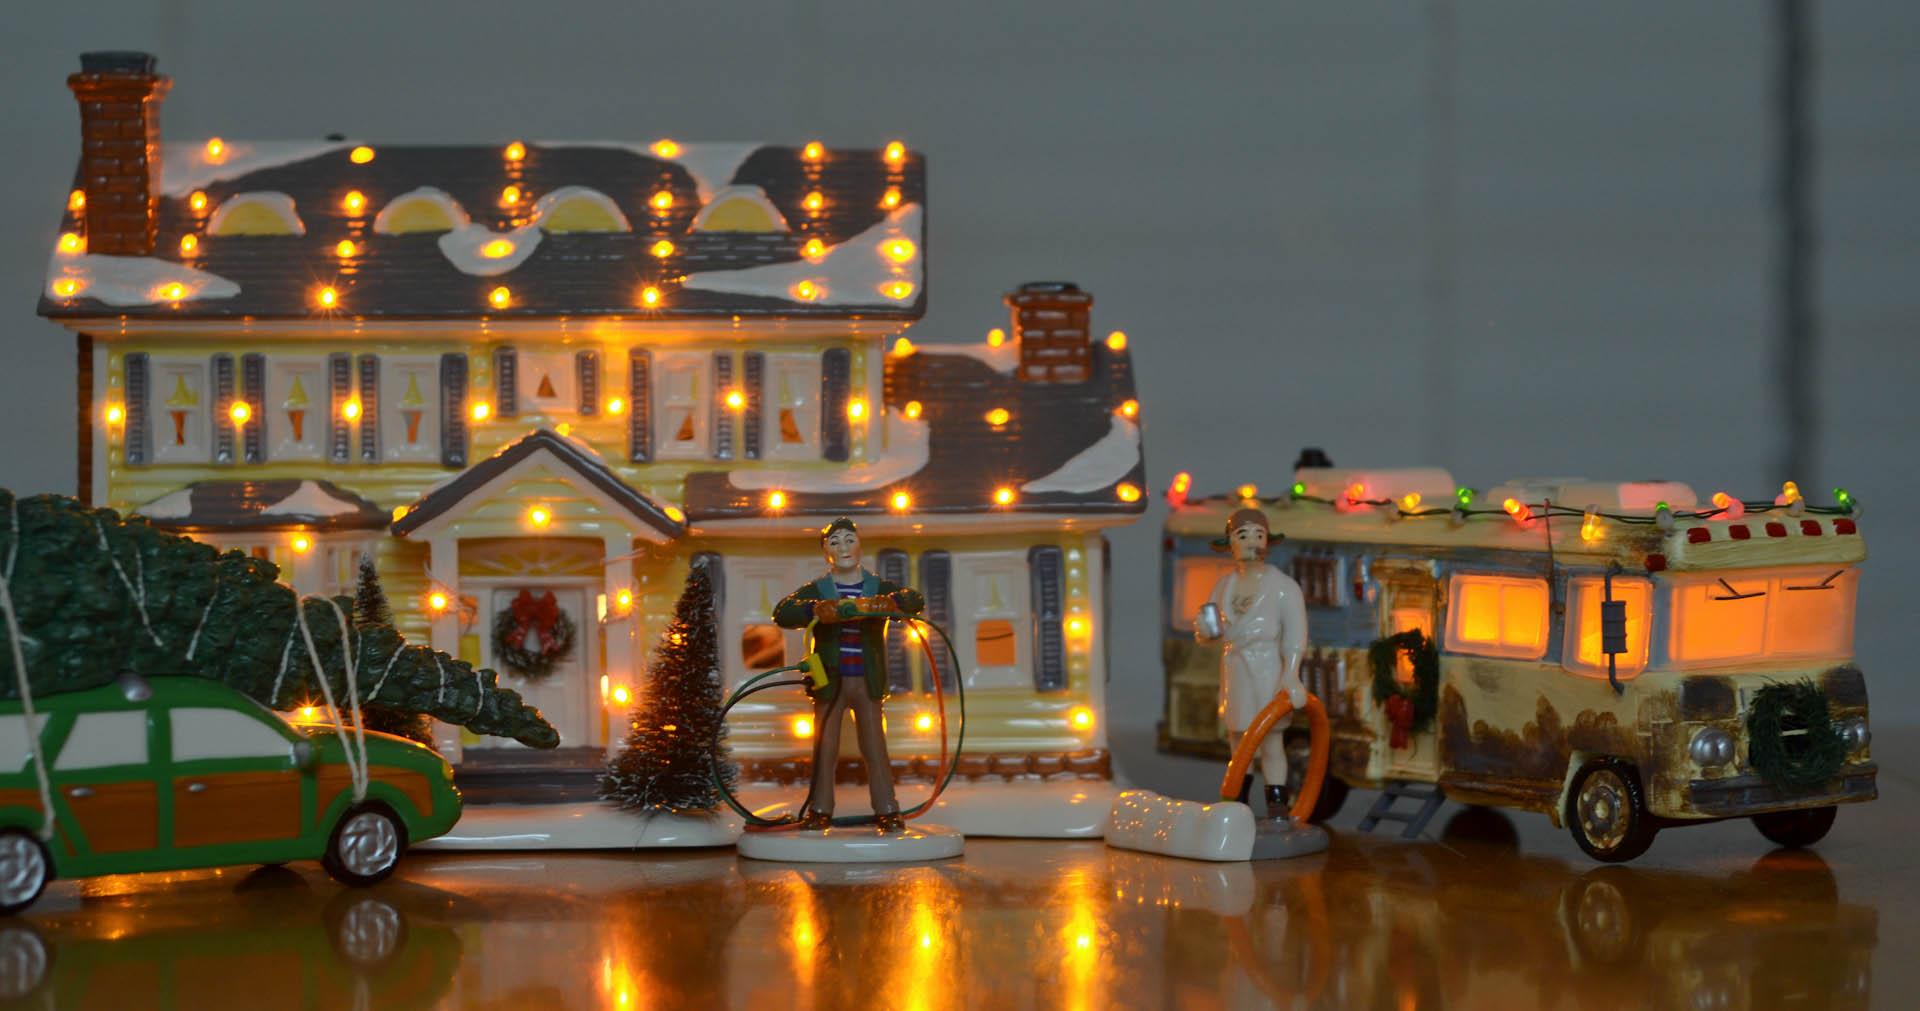 -CHRISTMAS-VACATION national lampoon christmas comedy h wallpaper ...